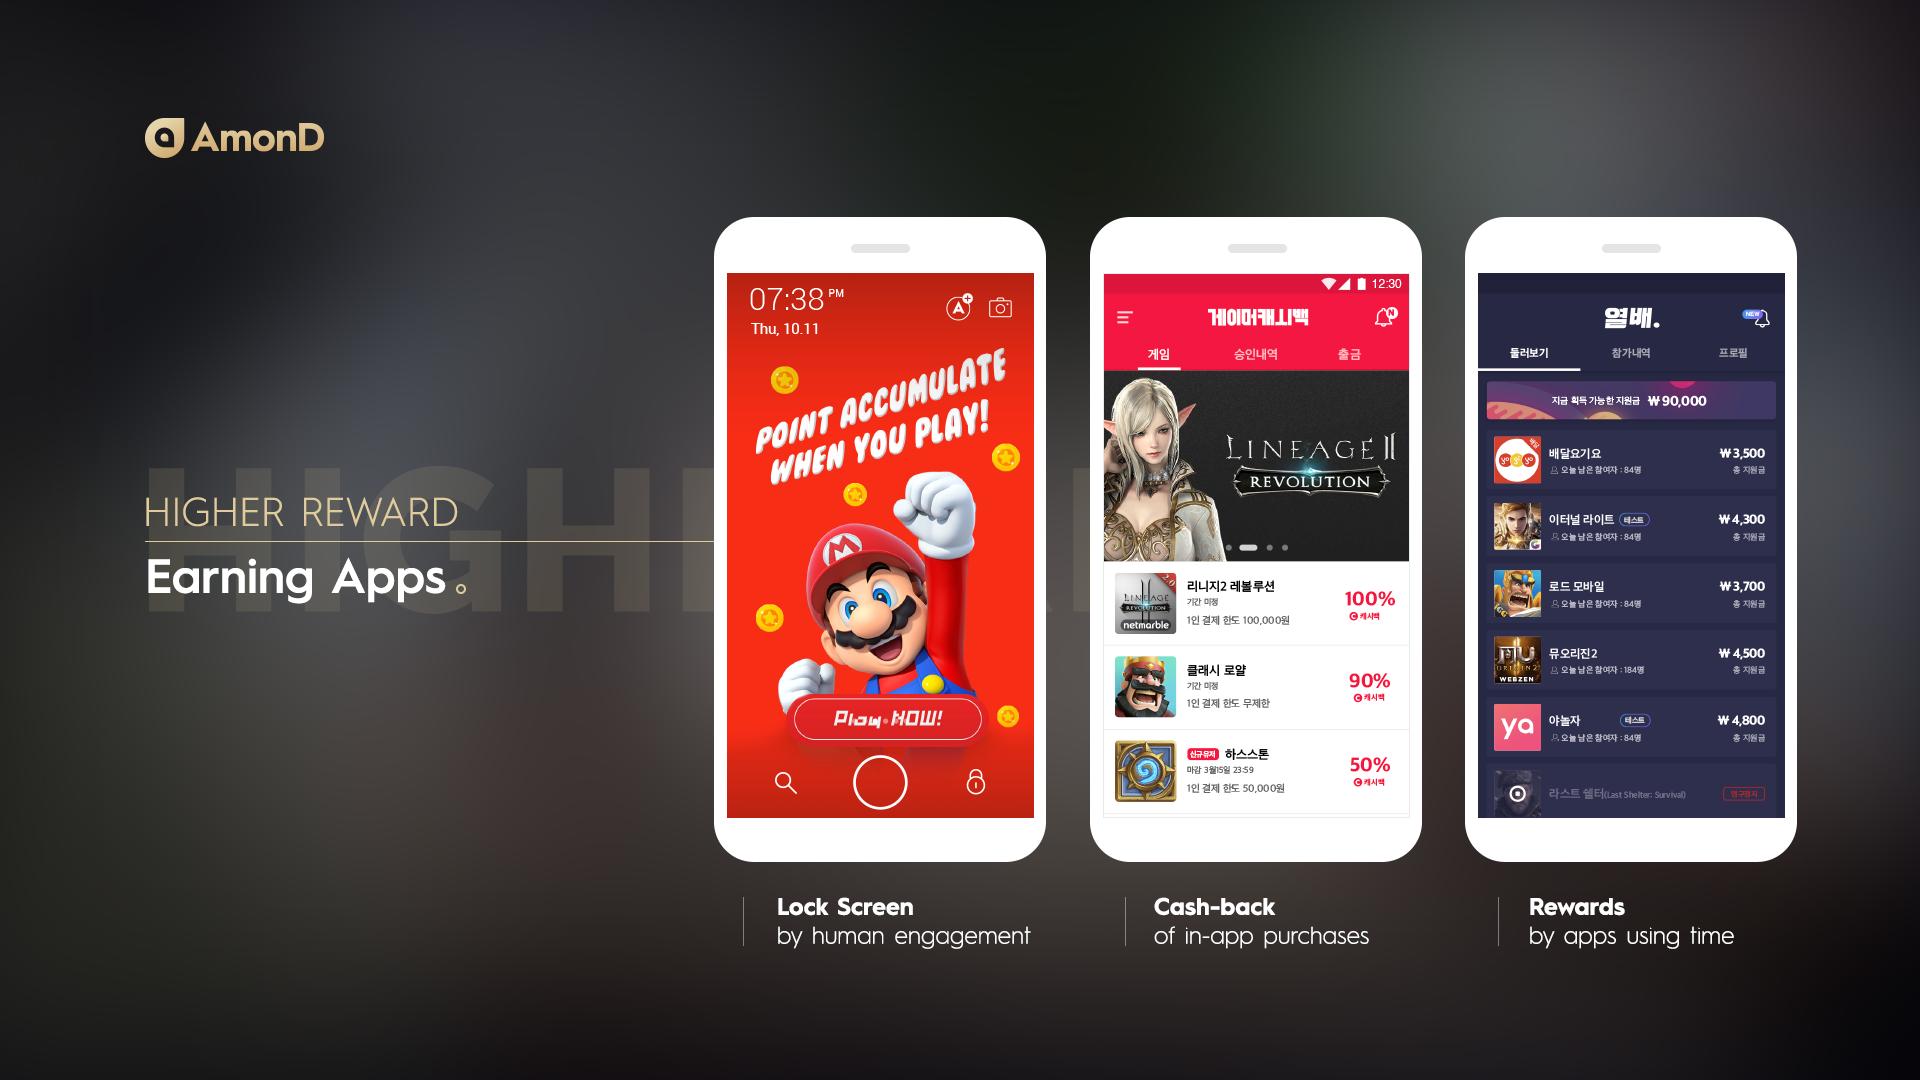 Earning Apps - AmonD Earning App是消费者参与广告活动并接受奖励的分散应用。Earning App不仅提供广告和玩游戏的功能、还具有利用企业赞助的内容而进行特别任务等的多种功能、这在之前是无法想象的。将通过已在市场中得到验证的AmonD的伙伴来上市。